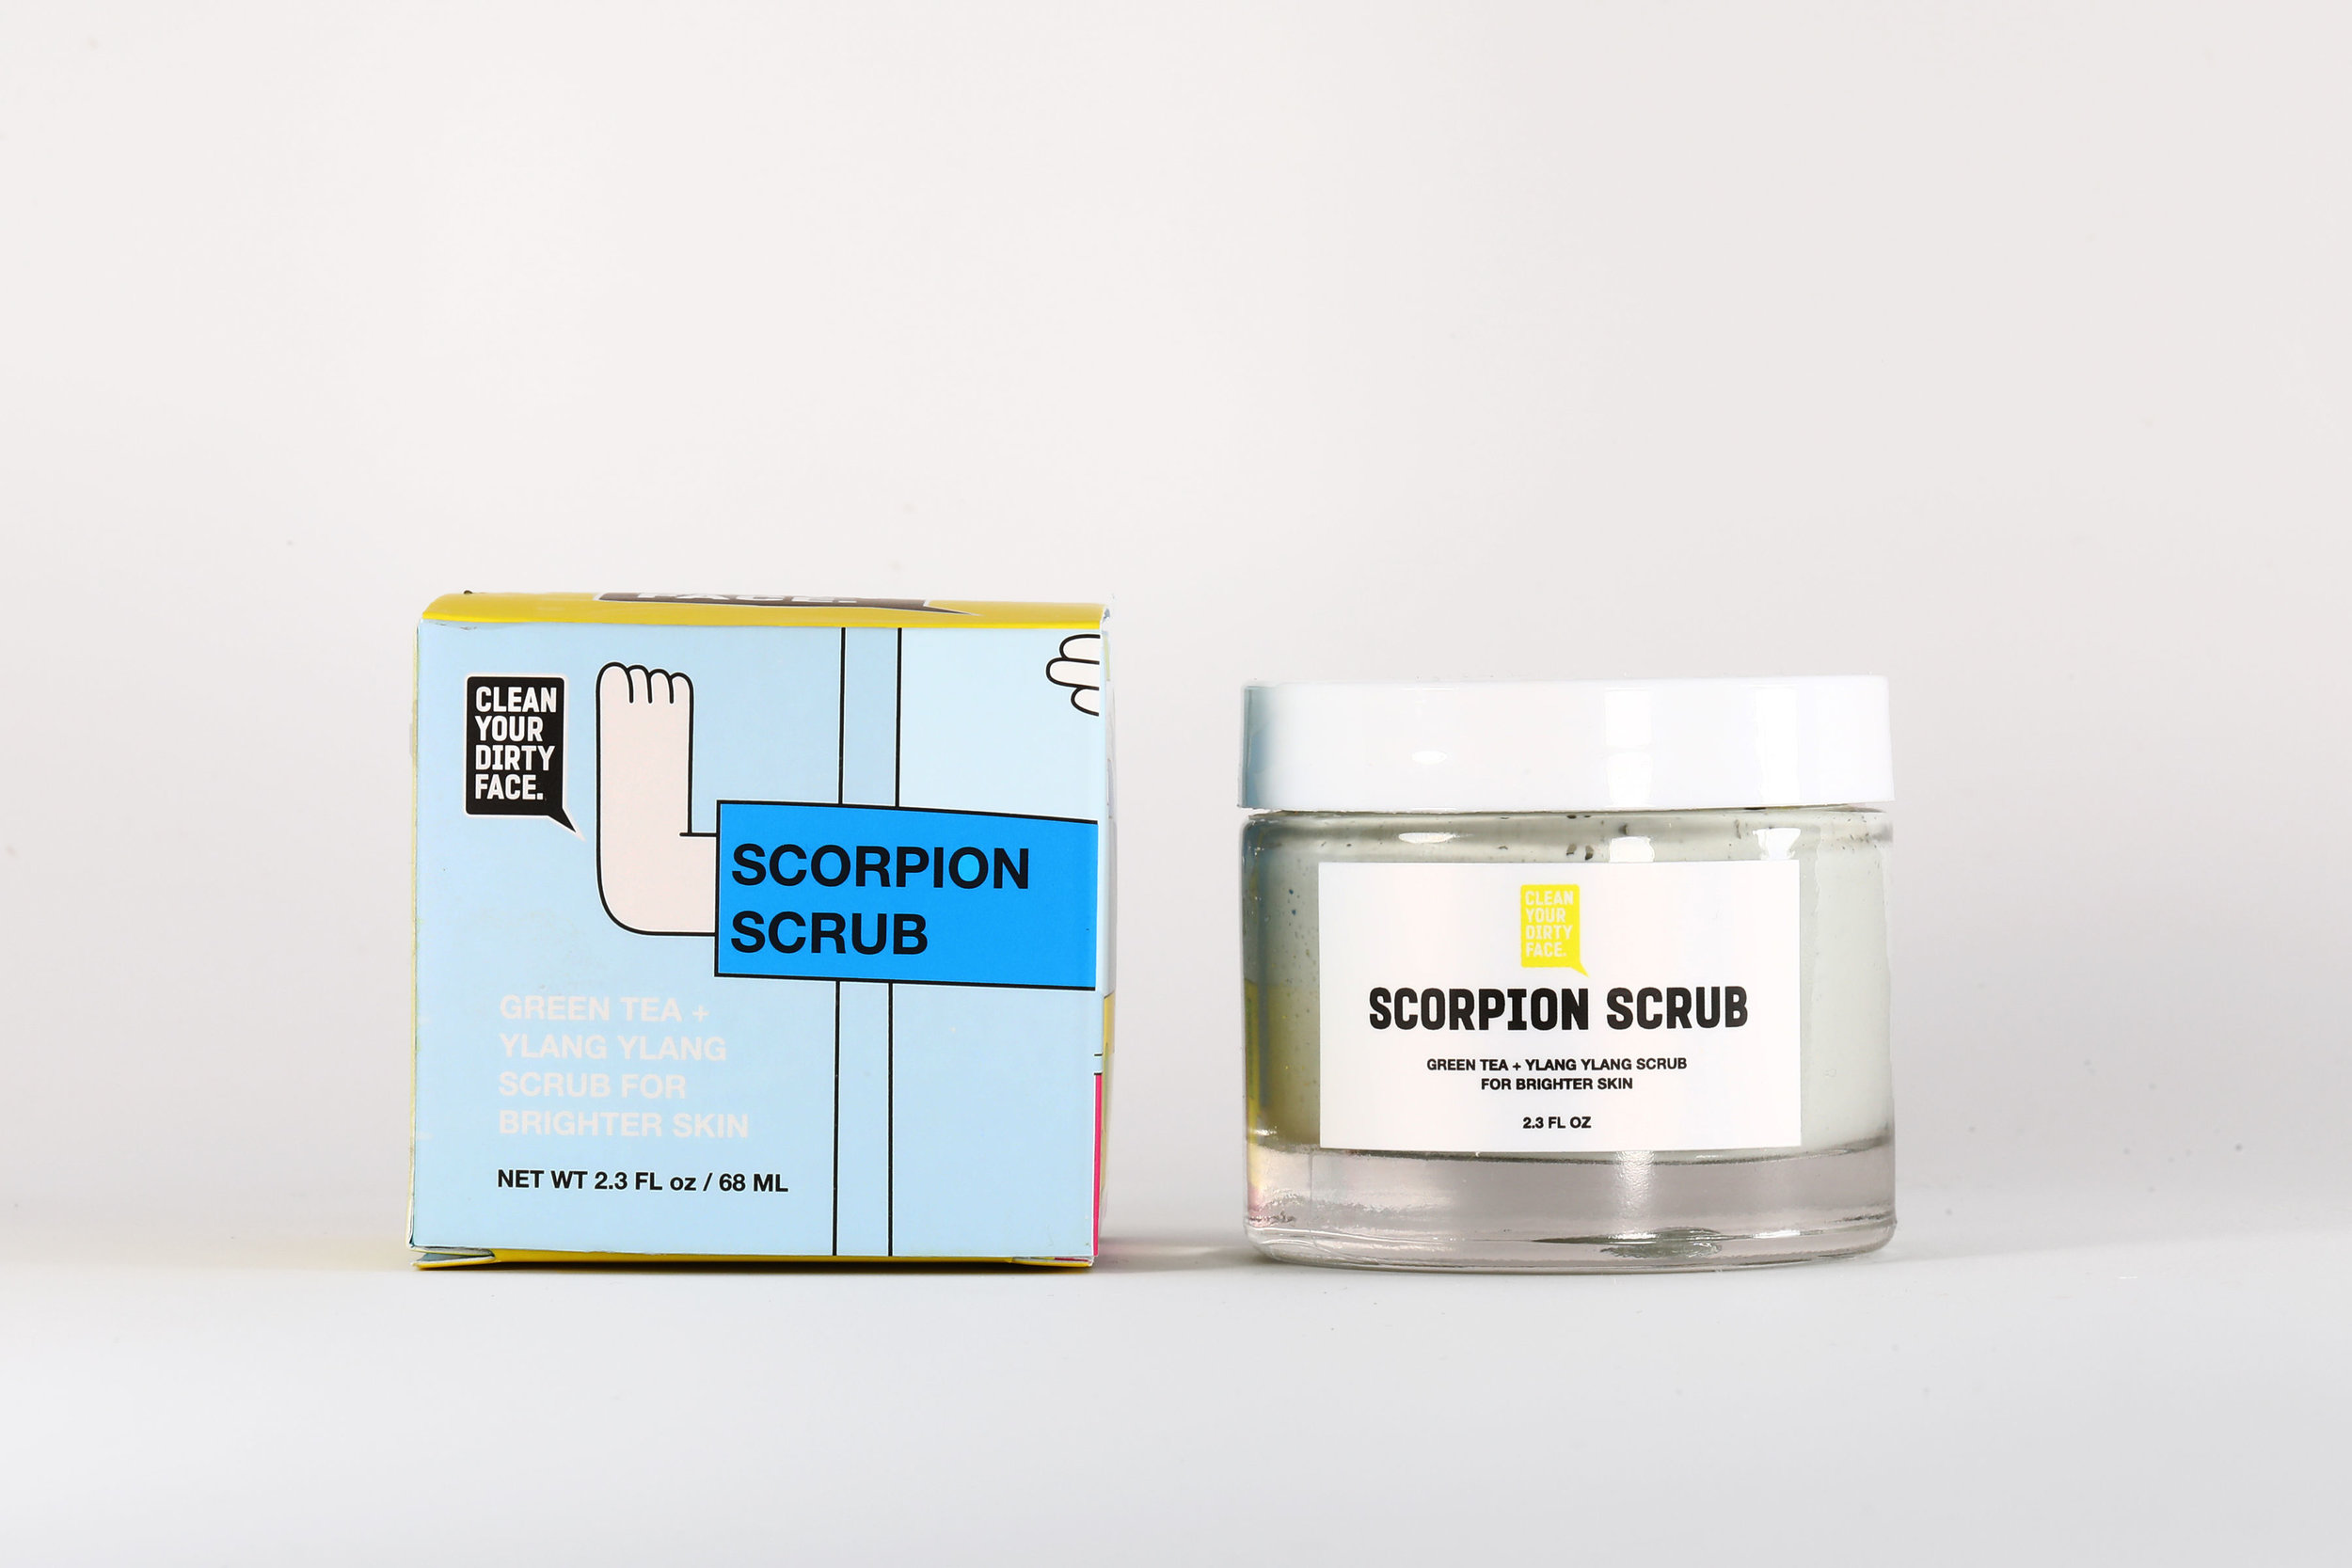 Scorpion Scrub - $44.00